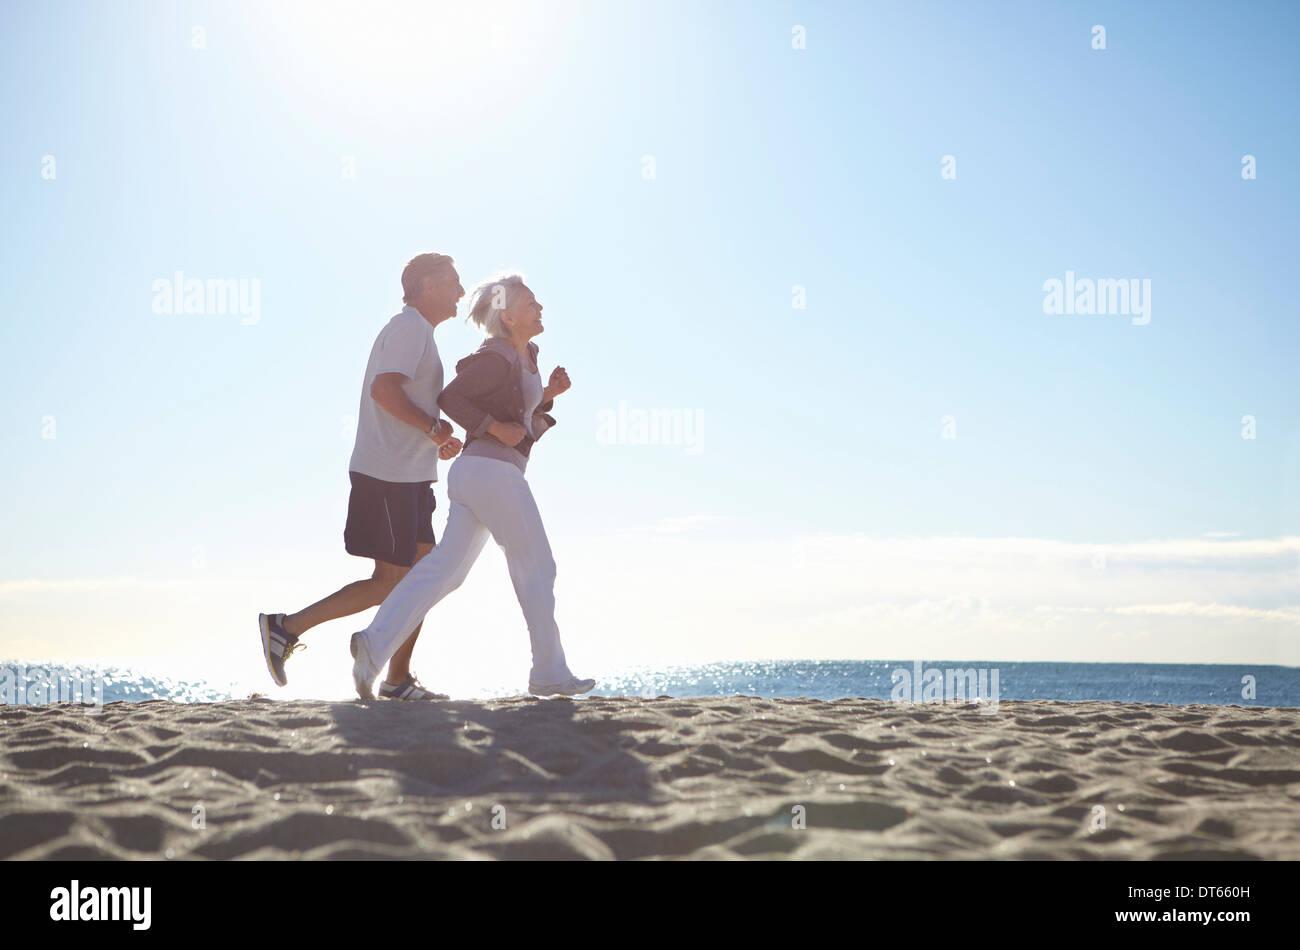 Couple jogging on beach - Stock Image